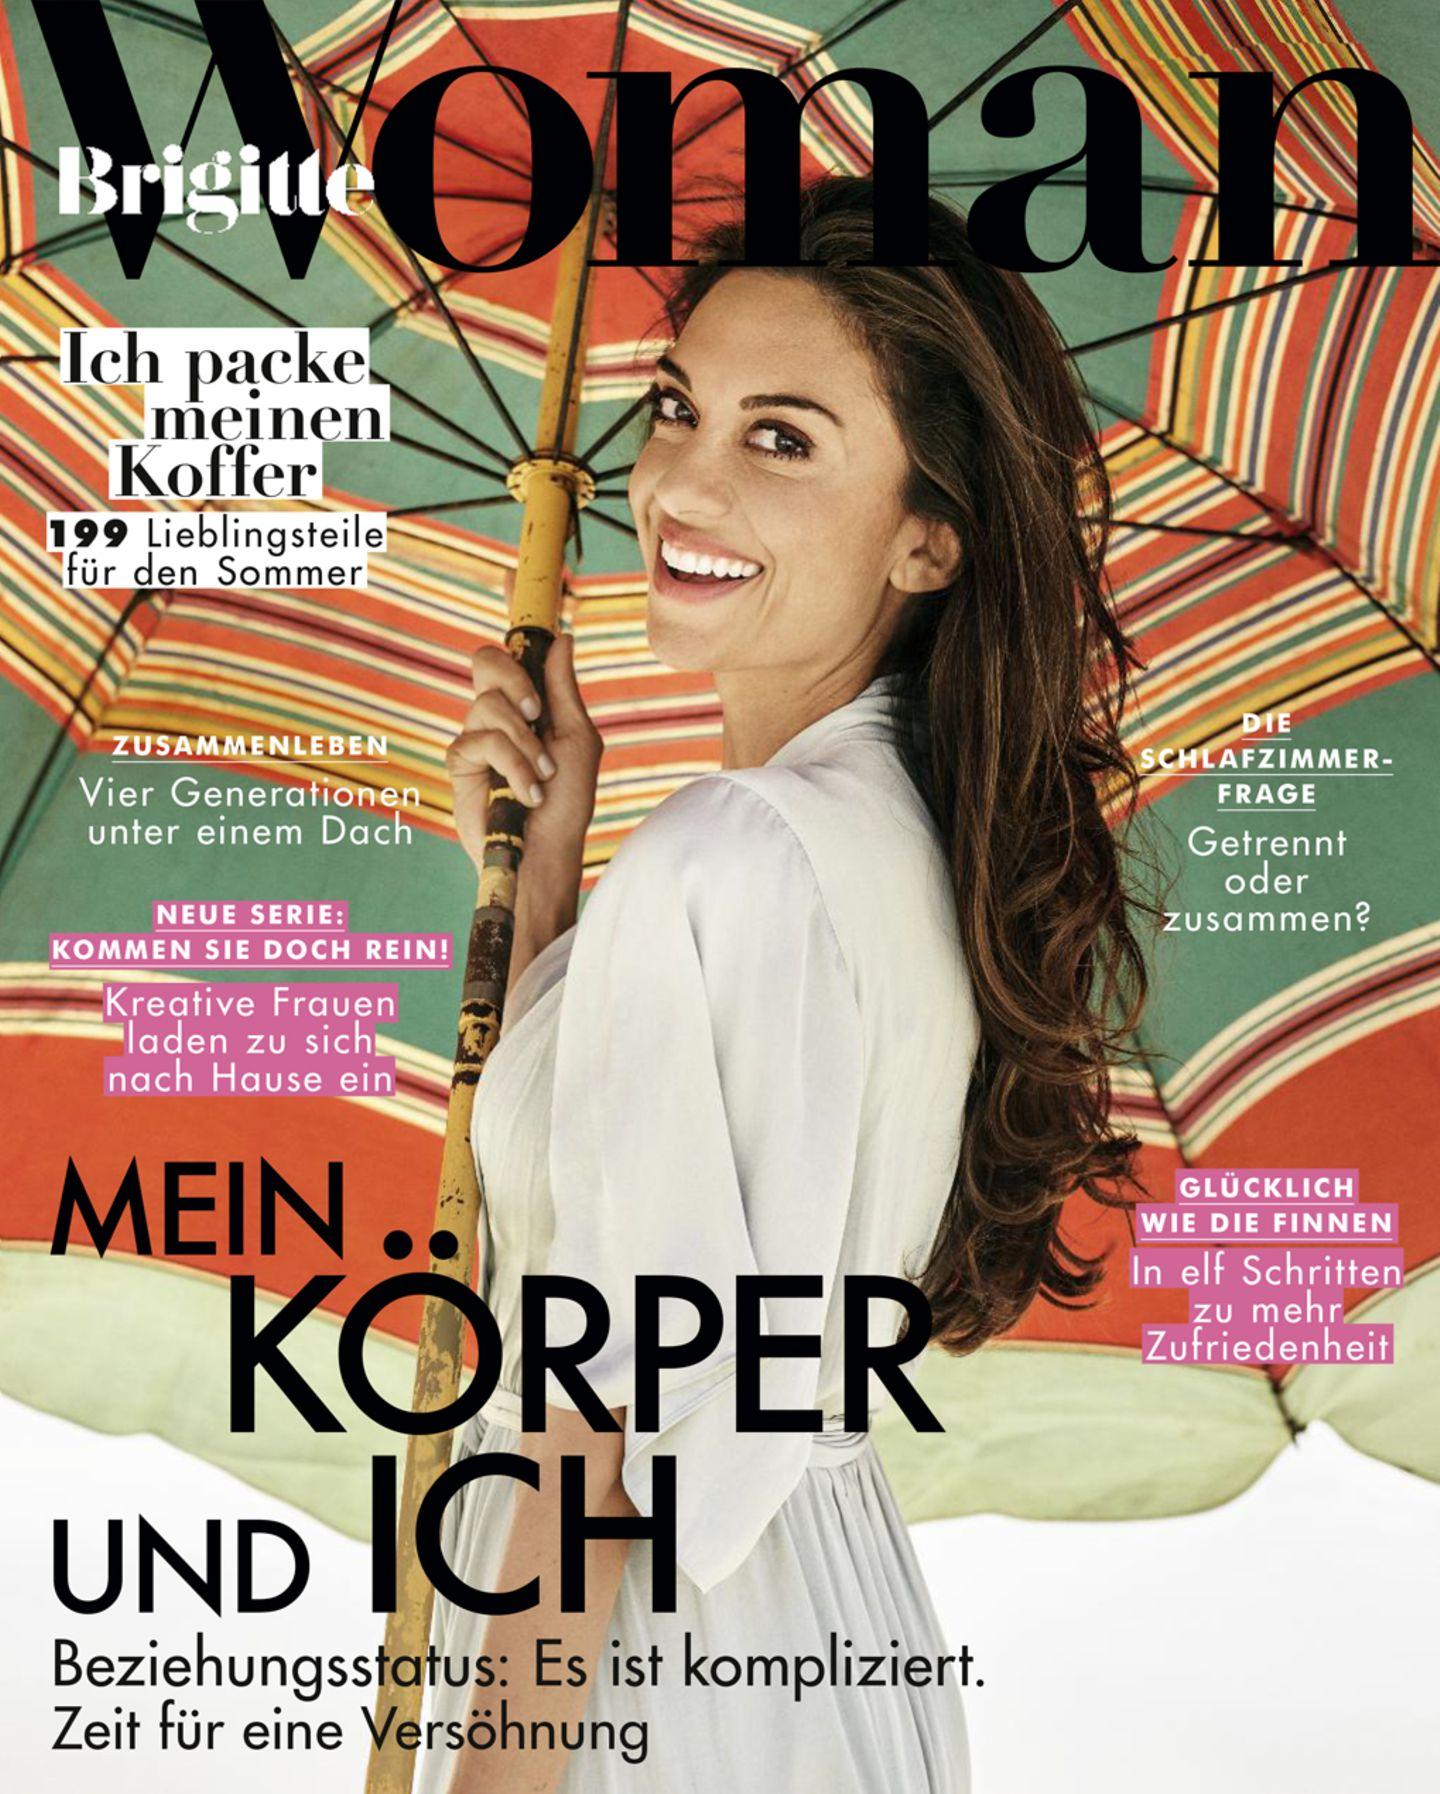 Heftvorschau Brigitte 07